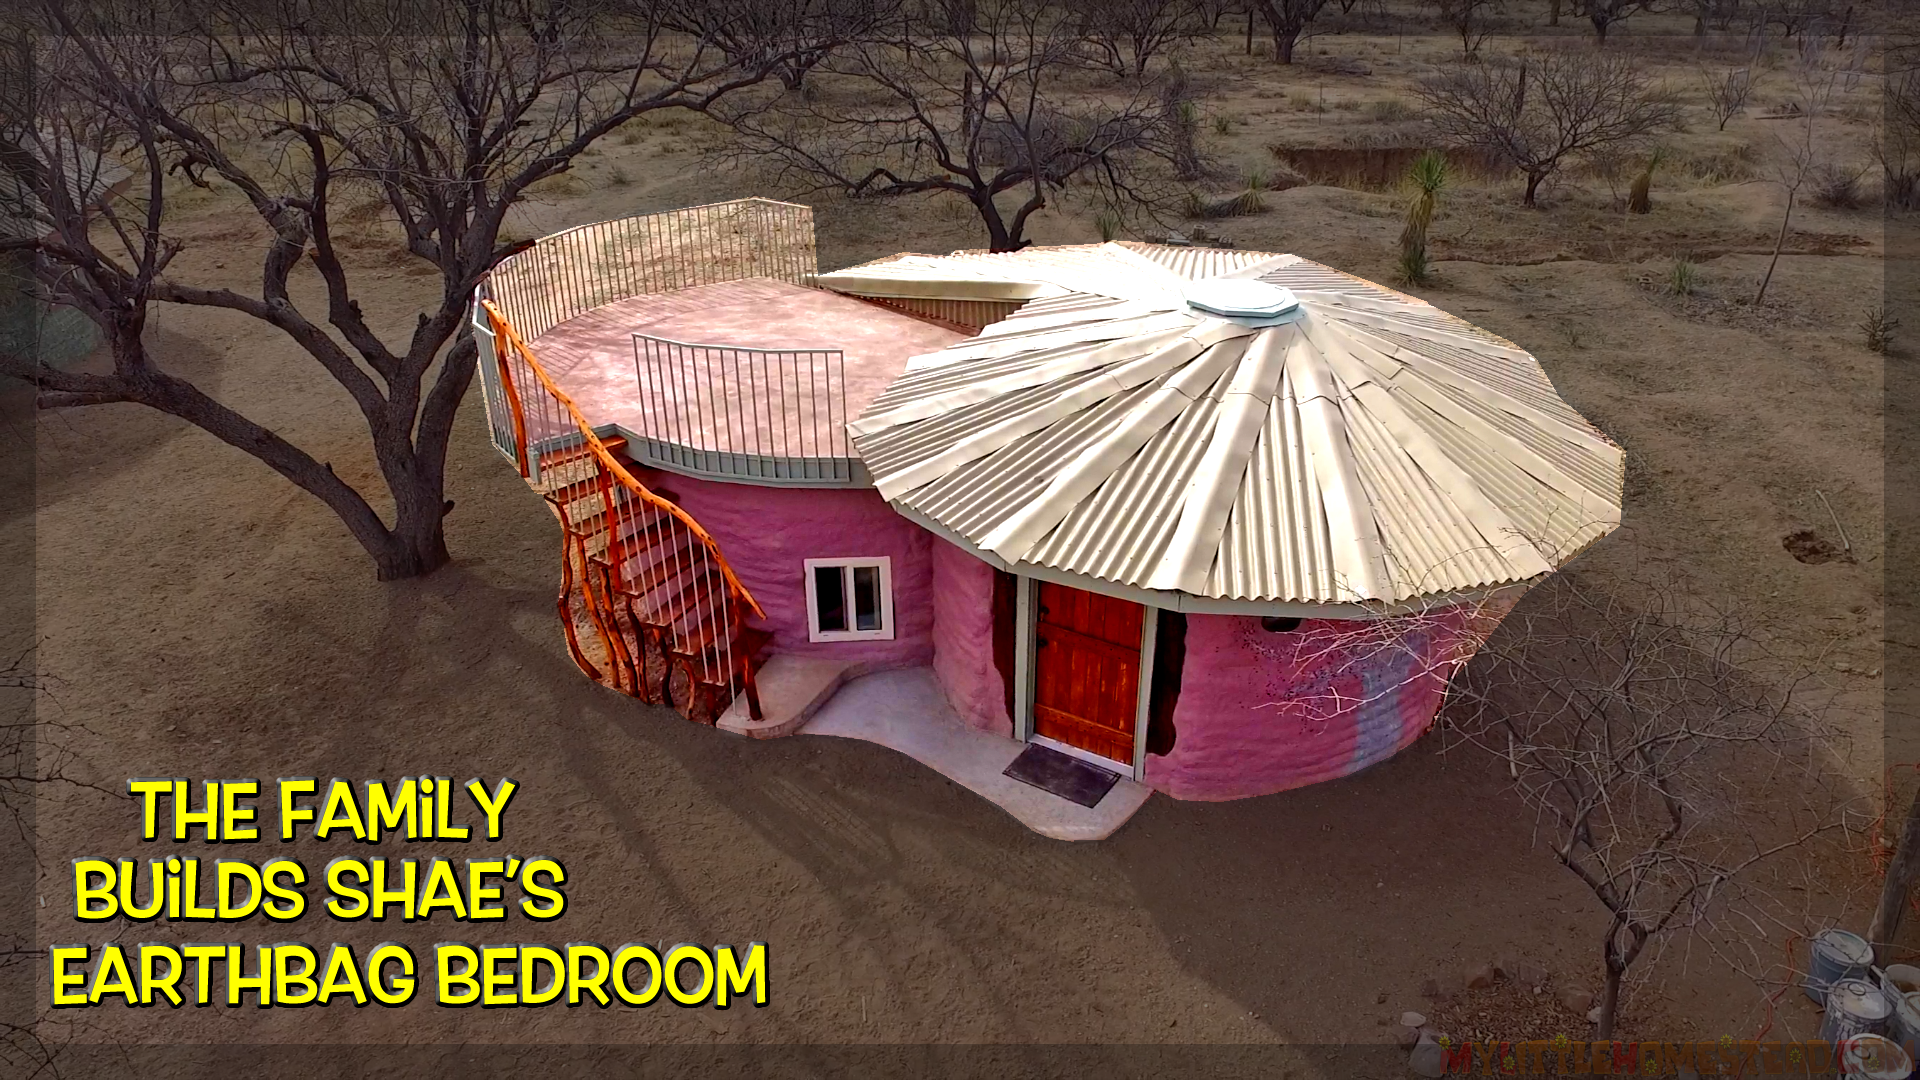 The Family Builds Shae's Earthbag Bedroom